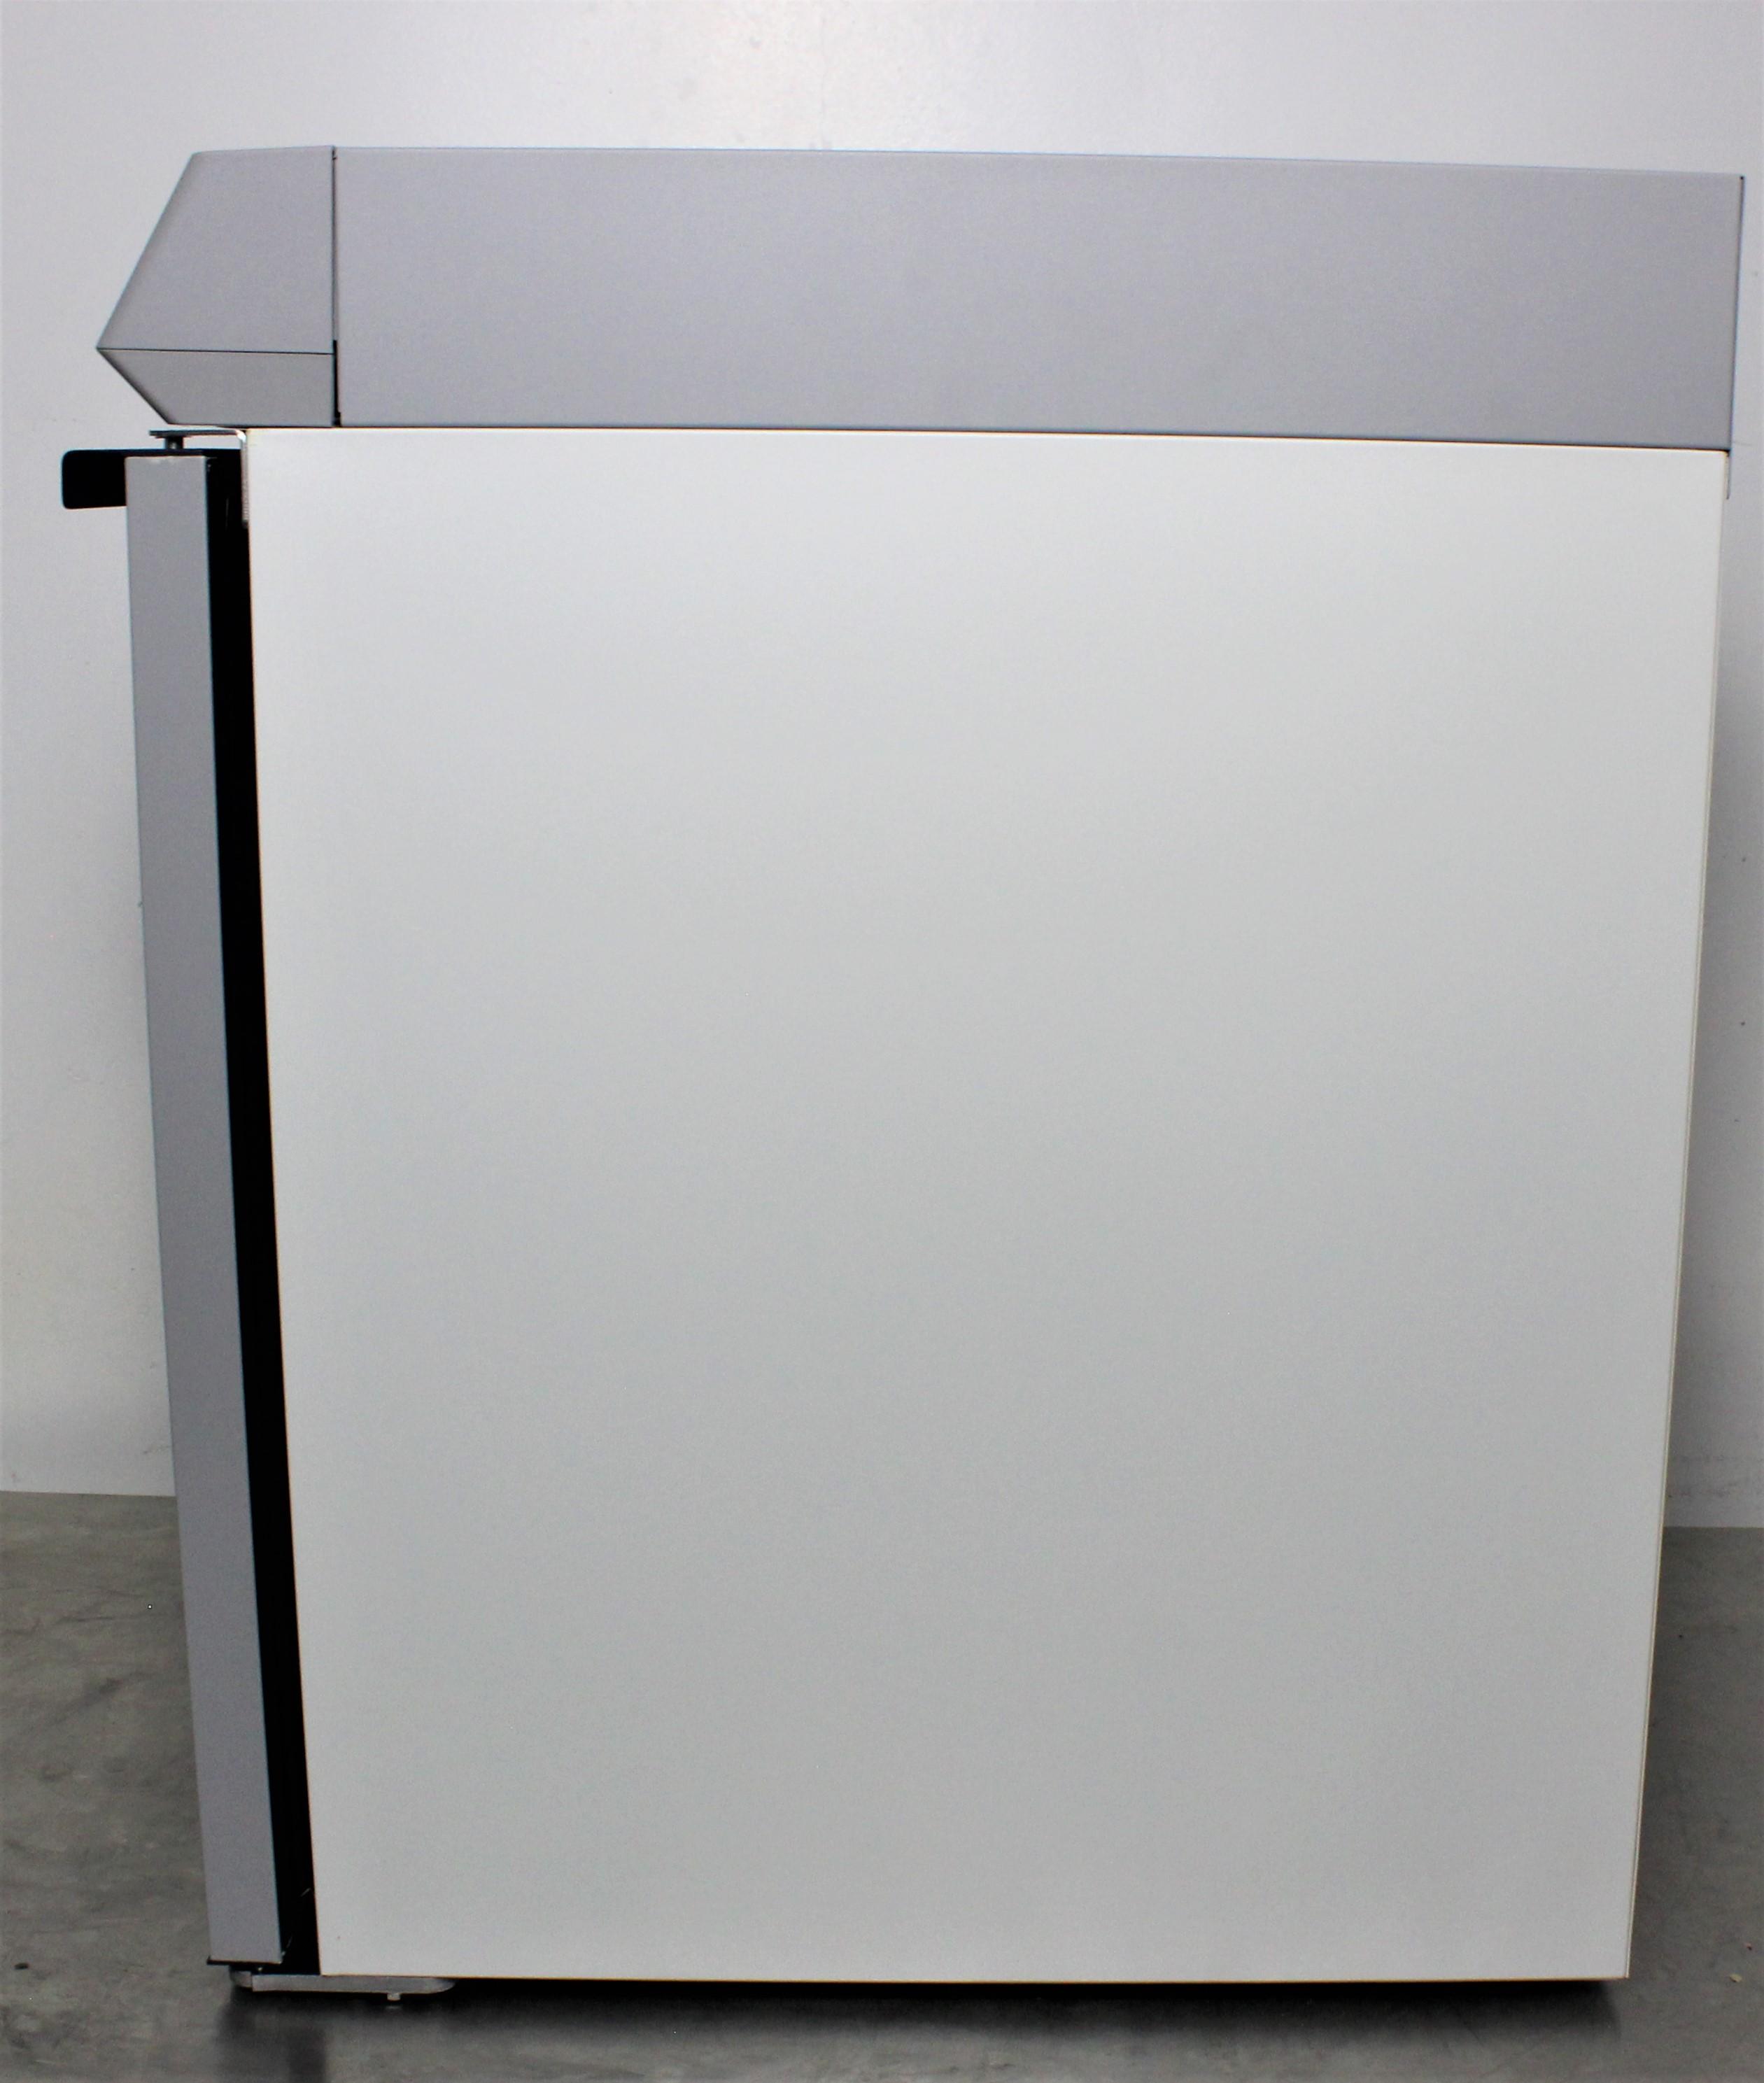 Image THERMO SCIENTIFIC TSX Series Laboratory Refrigerator - 5.5 Cu. Ft. 1587094